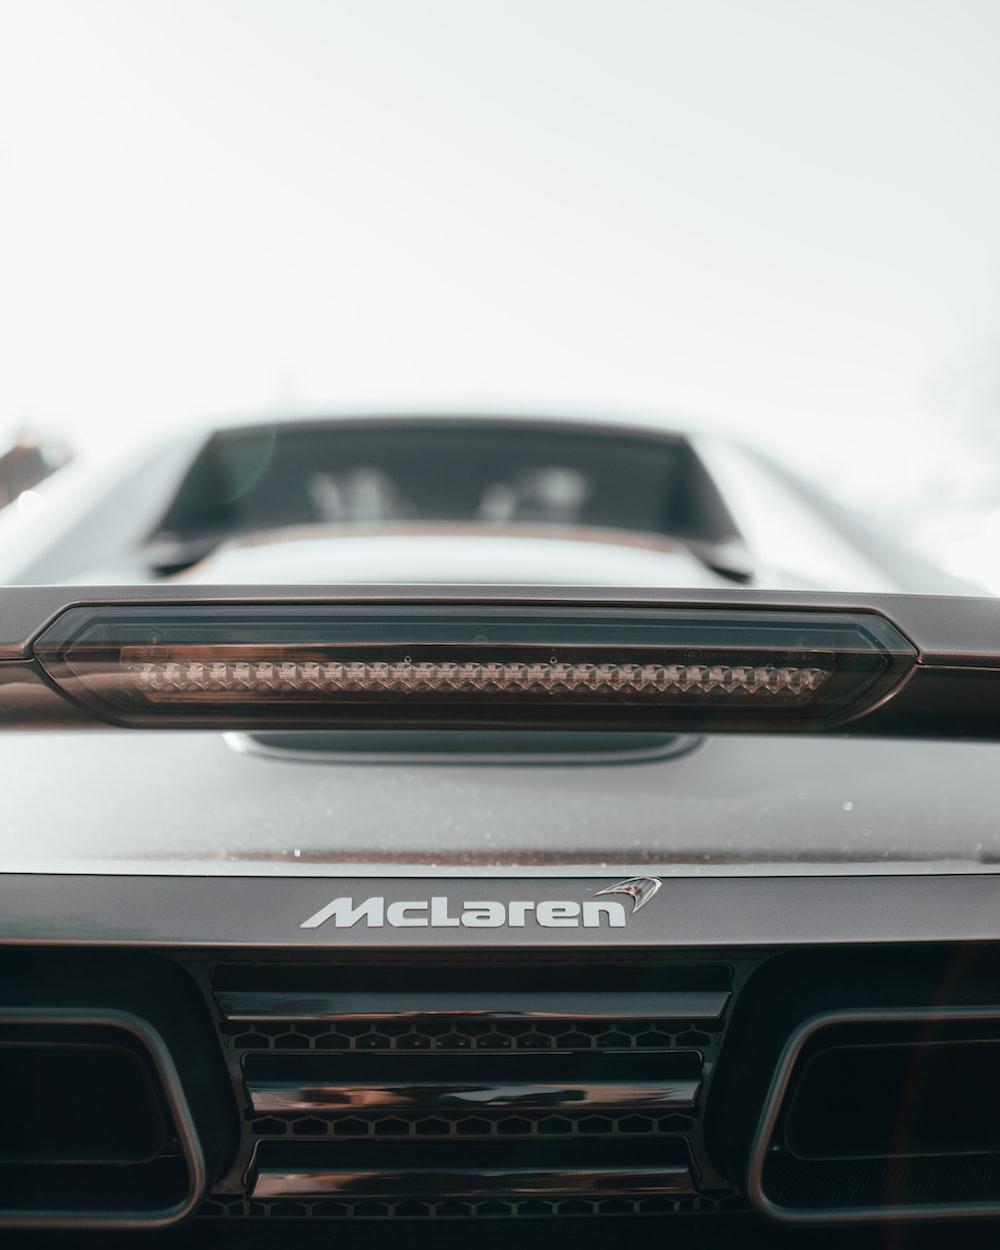 selective focus photography of black Mclaren vehicle